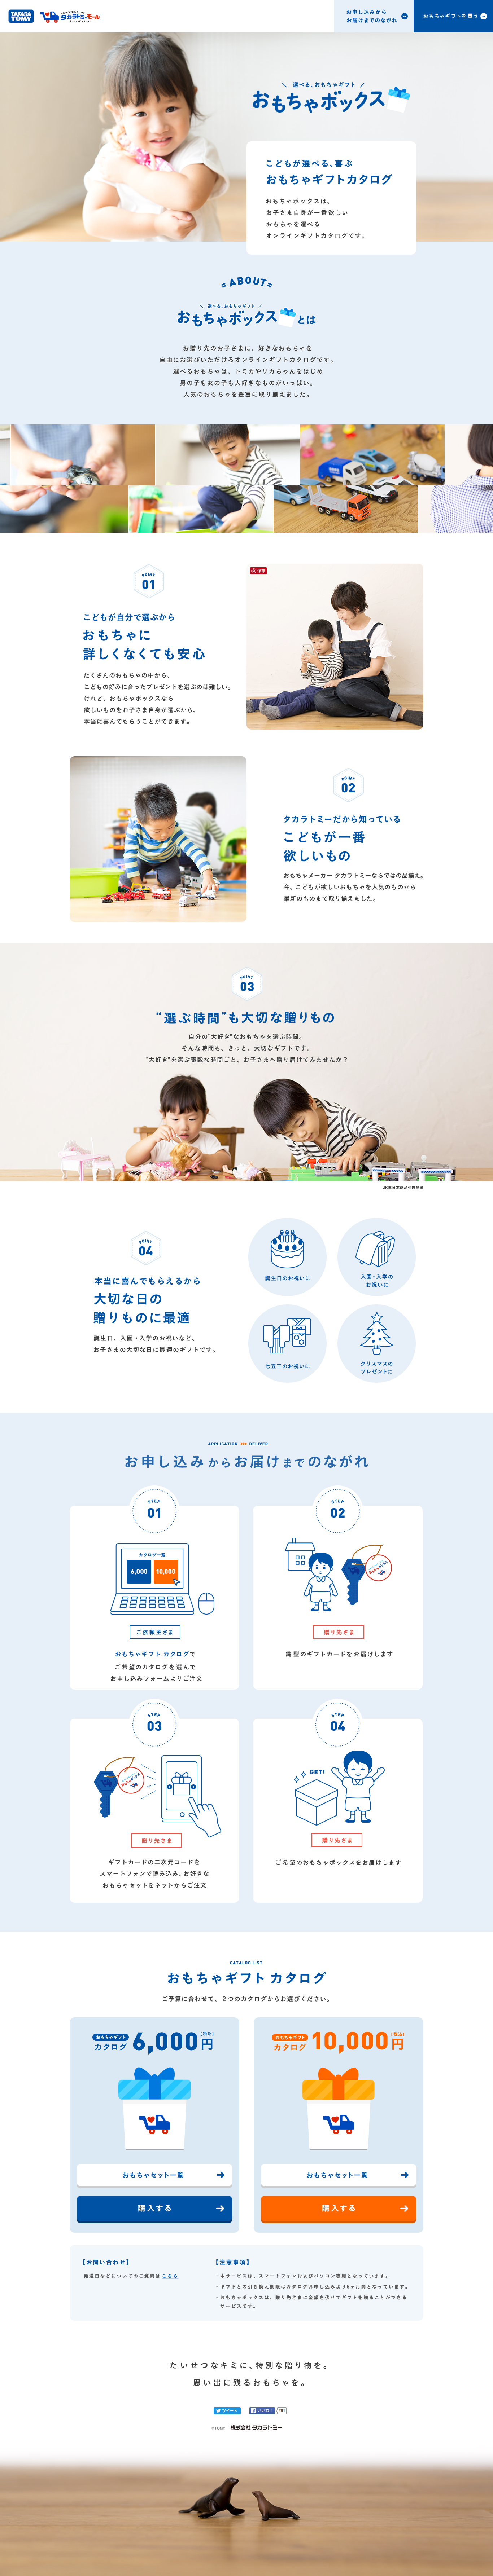 Gyazo - 選べる、おもちゃギフト おもちゃボックス | タカラトミーモール